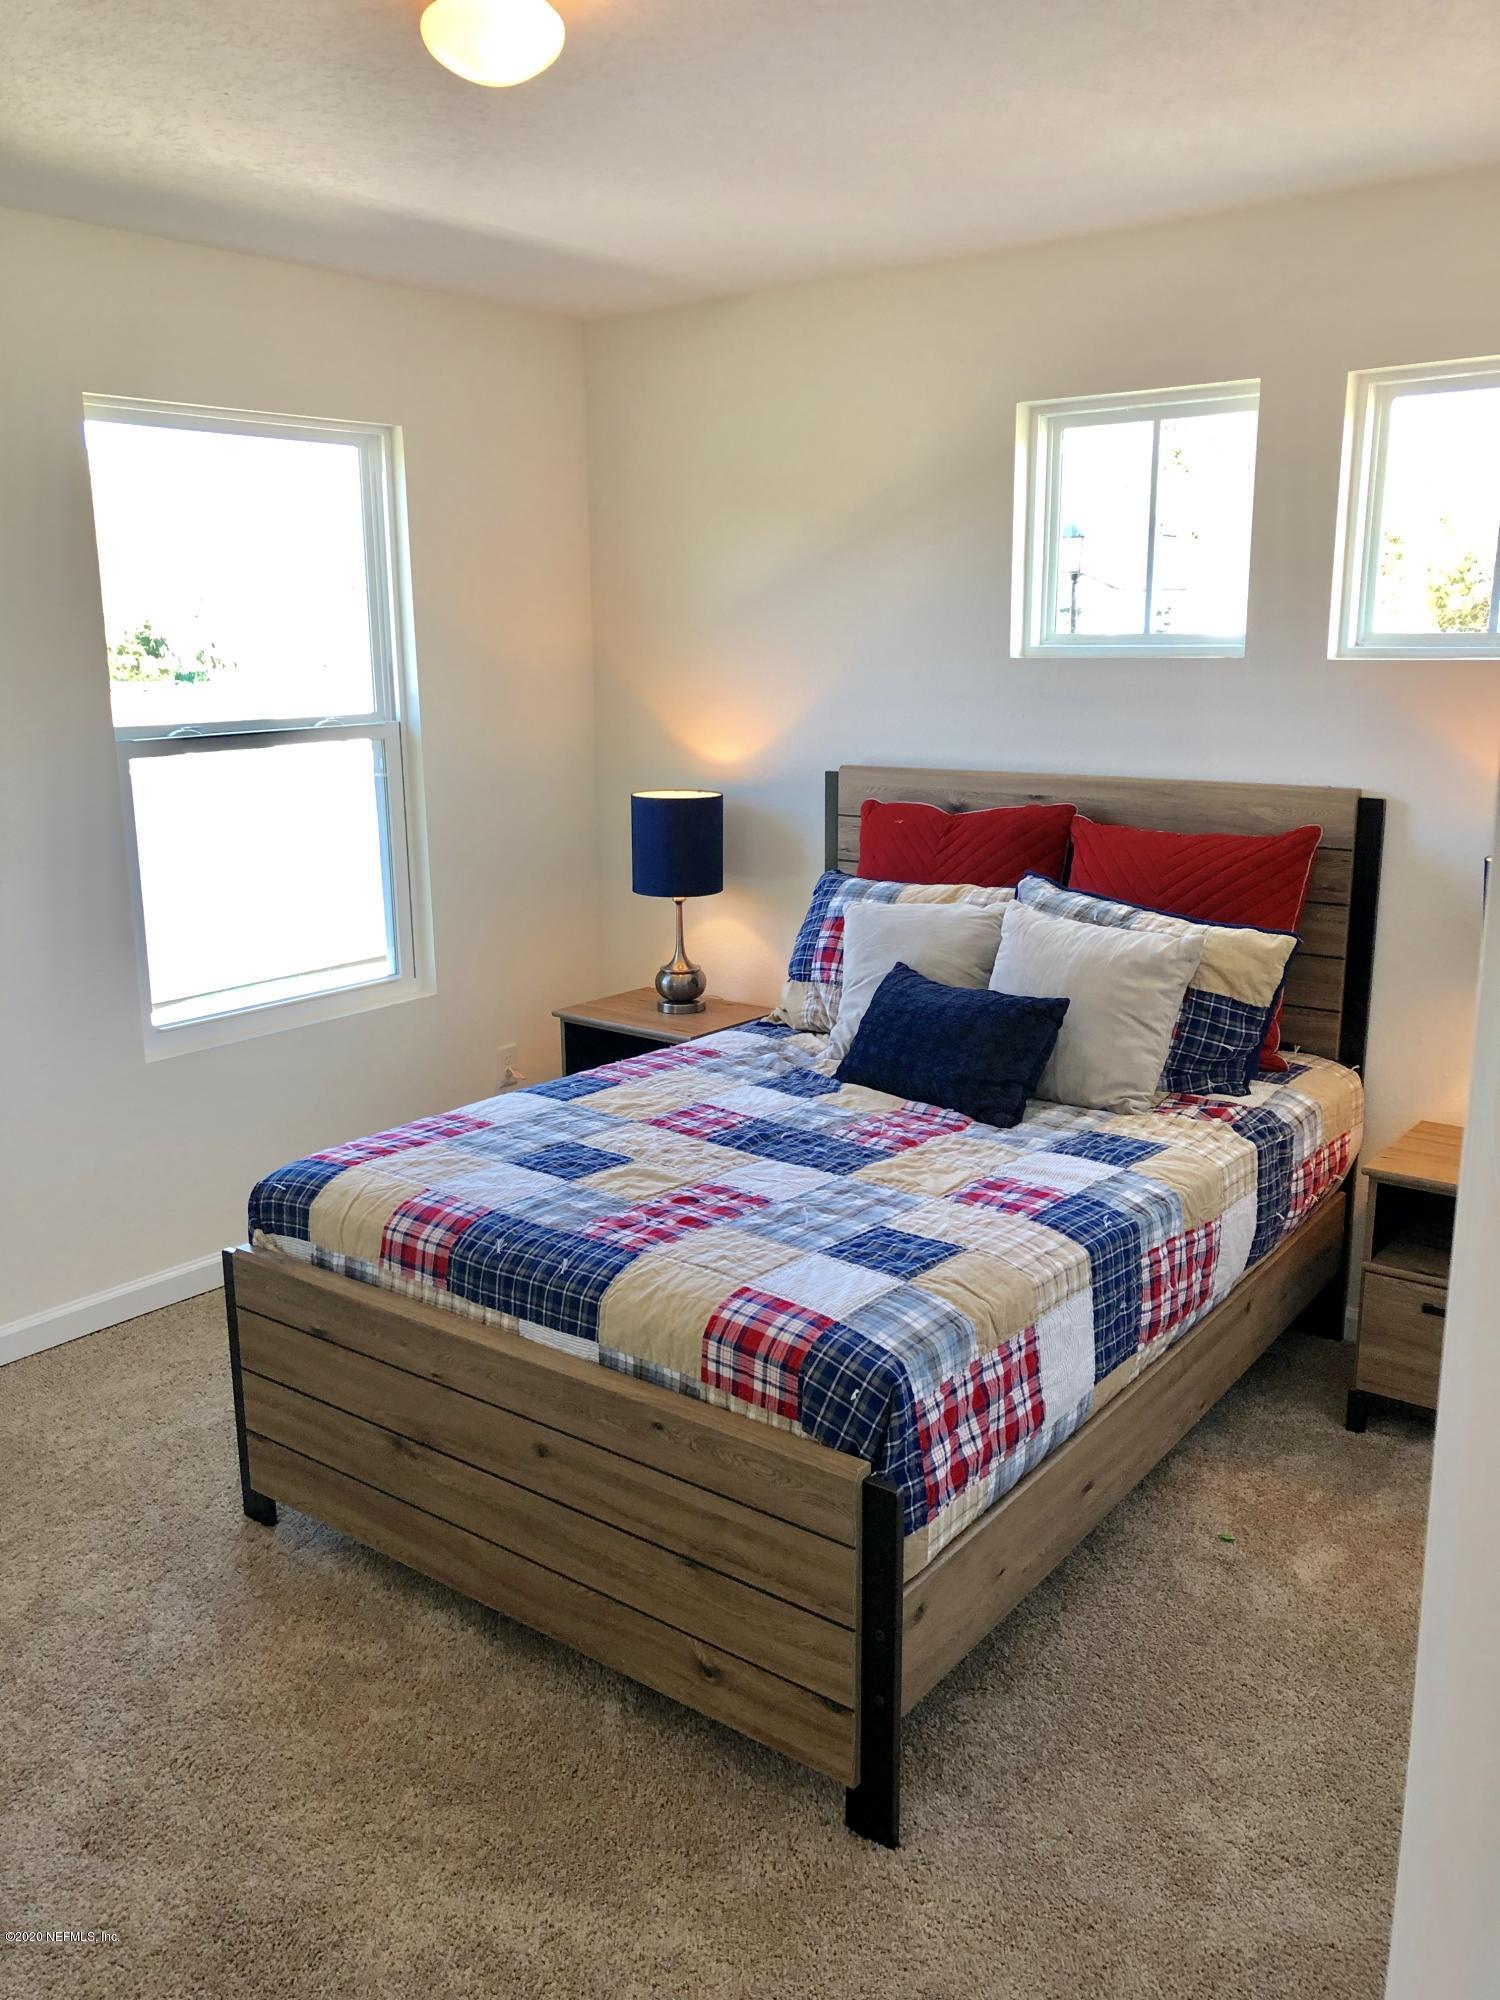 2920 HANGING VALLEY, ORANGE PARK, FLORIDA 32065, 4 Bedrooms Bedrooms, ,2 BathroomsBathrooms,Residential,For sale,HANGING VALLEY,1062880